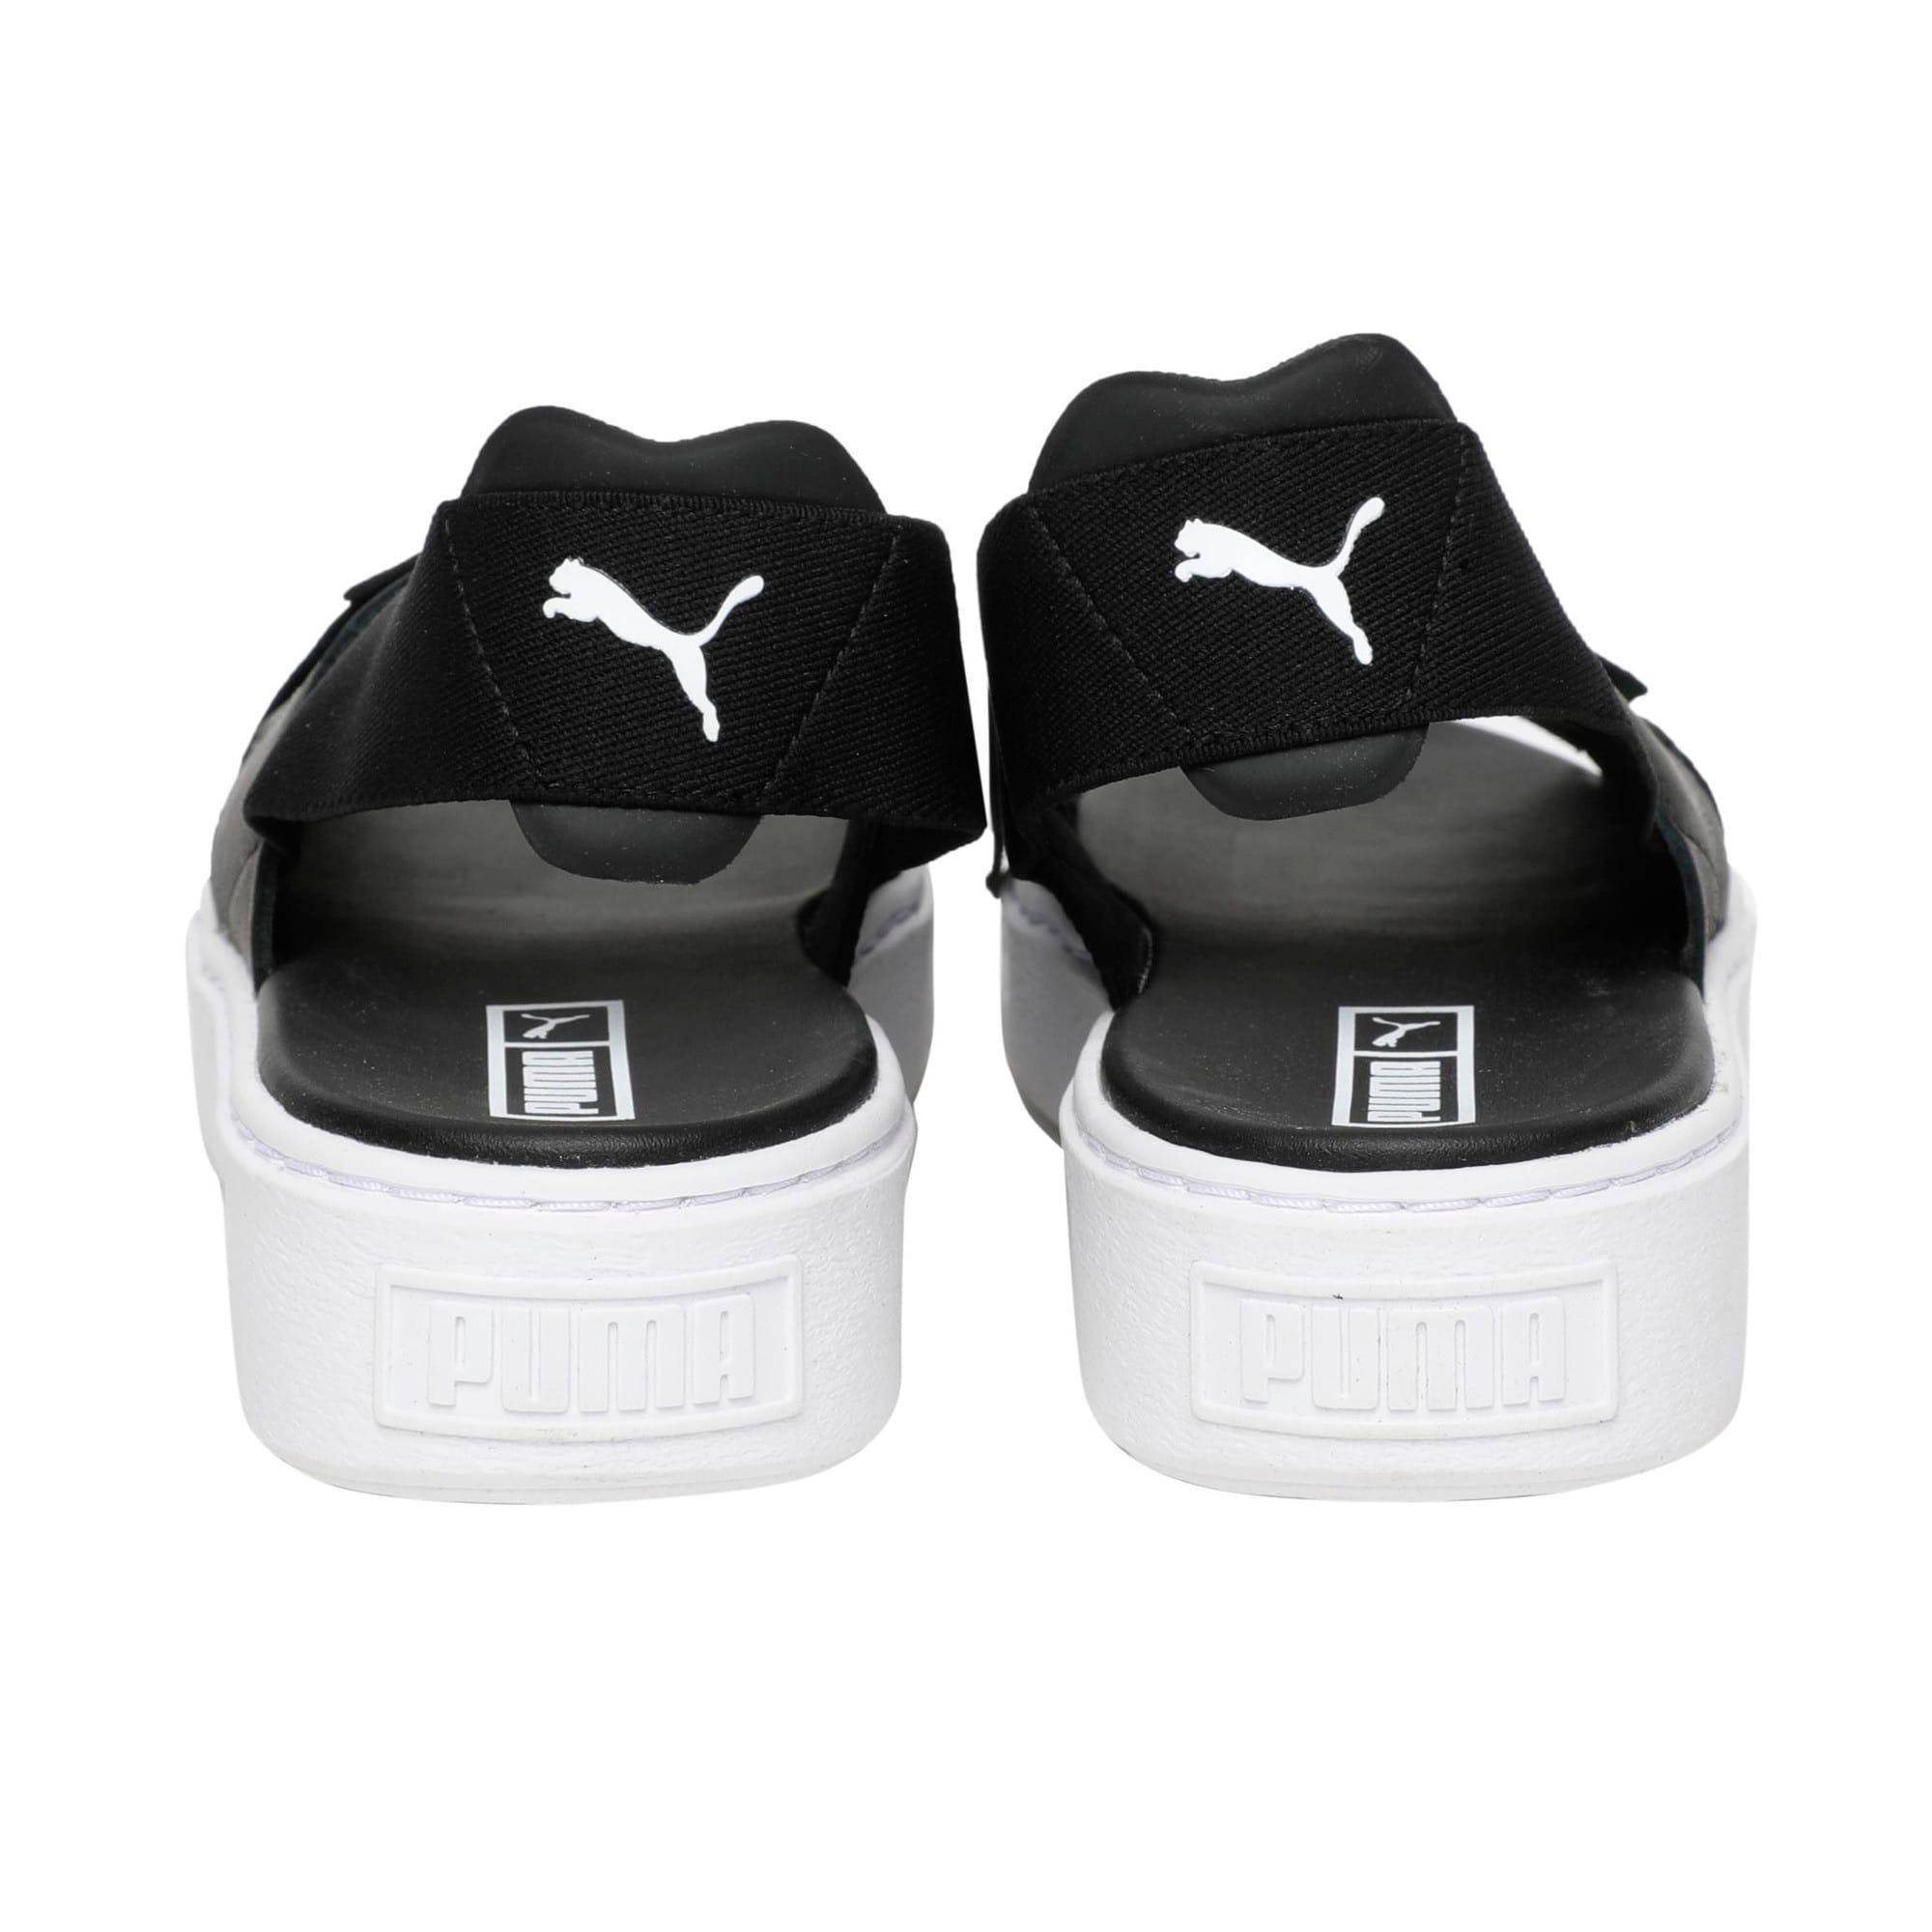 Thumbnail 4 of Platform Leather Women's Sandals, Puma Black-Puma Black, medium-IND